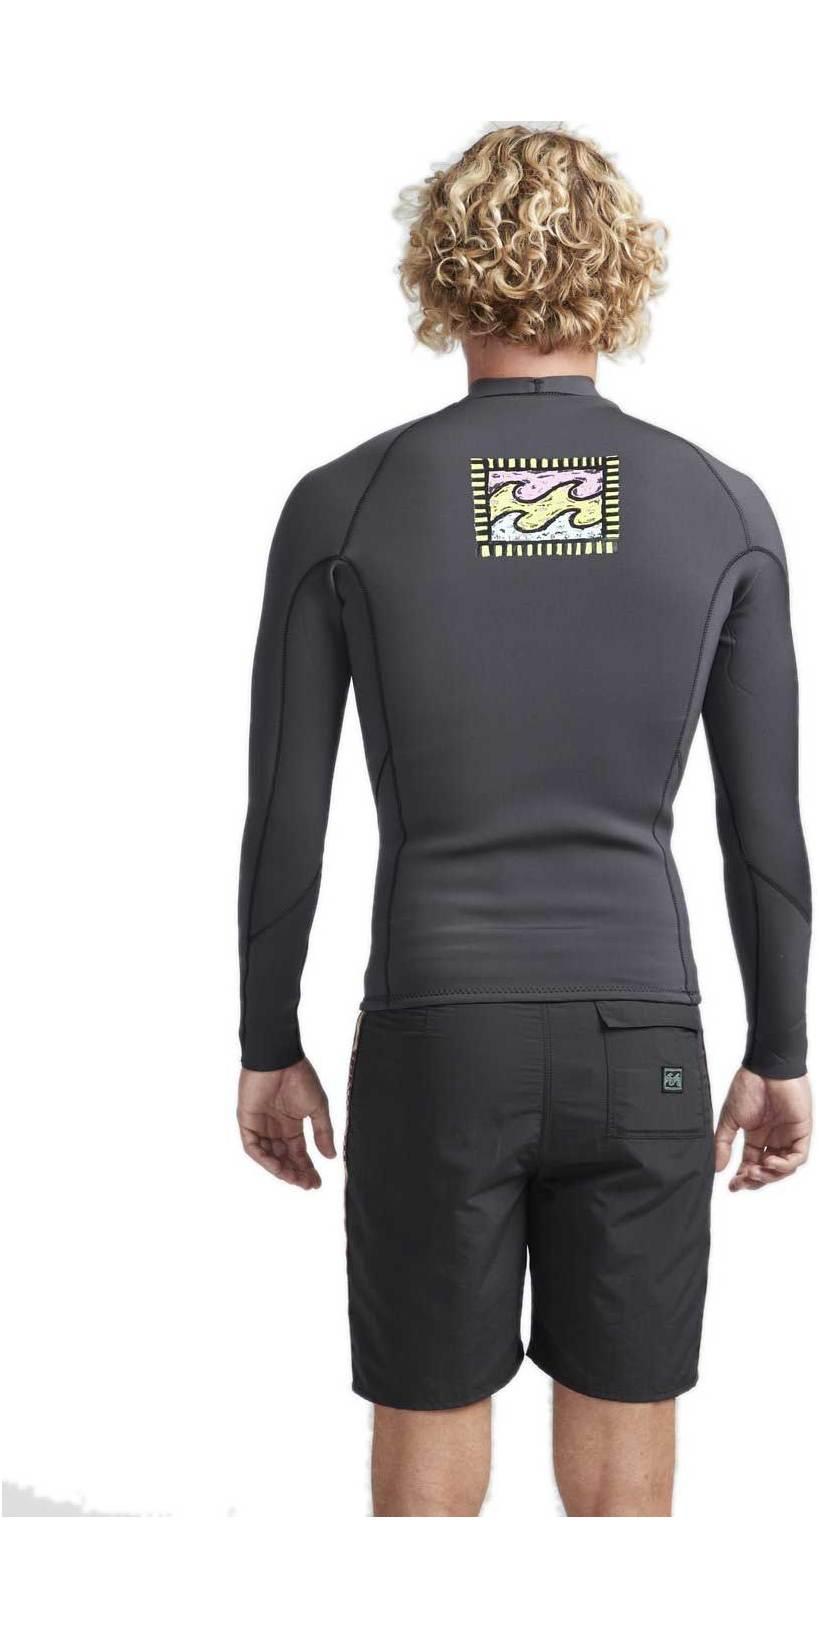 2019 Billabong Mens 2mm Furnace Revolution Reissue Long Sleeve Neo Jacket Black Sands N42M17